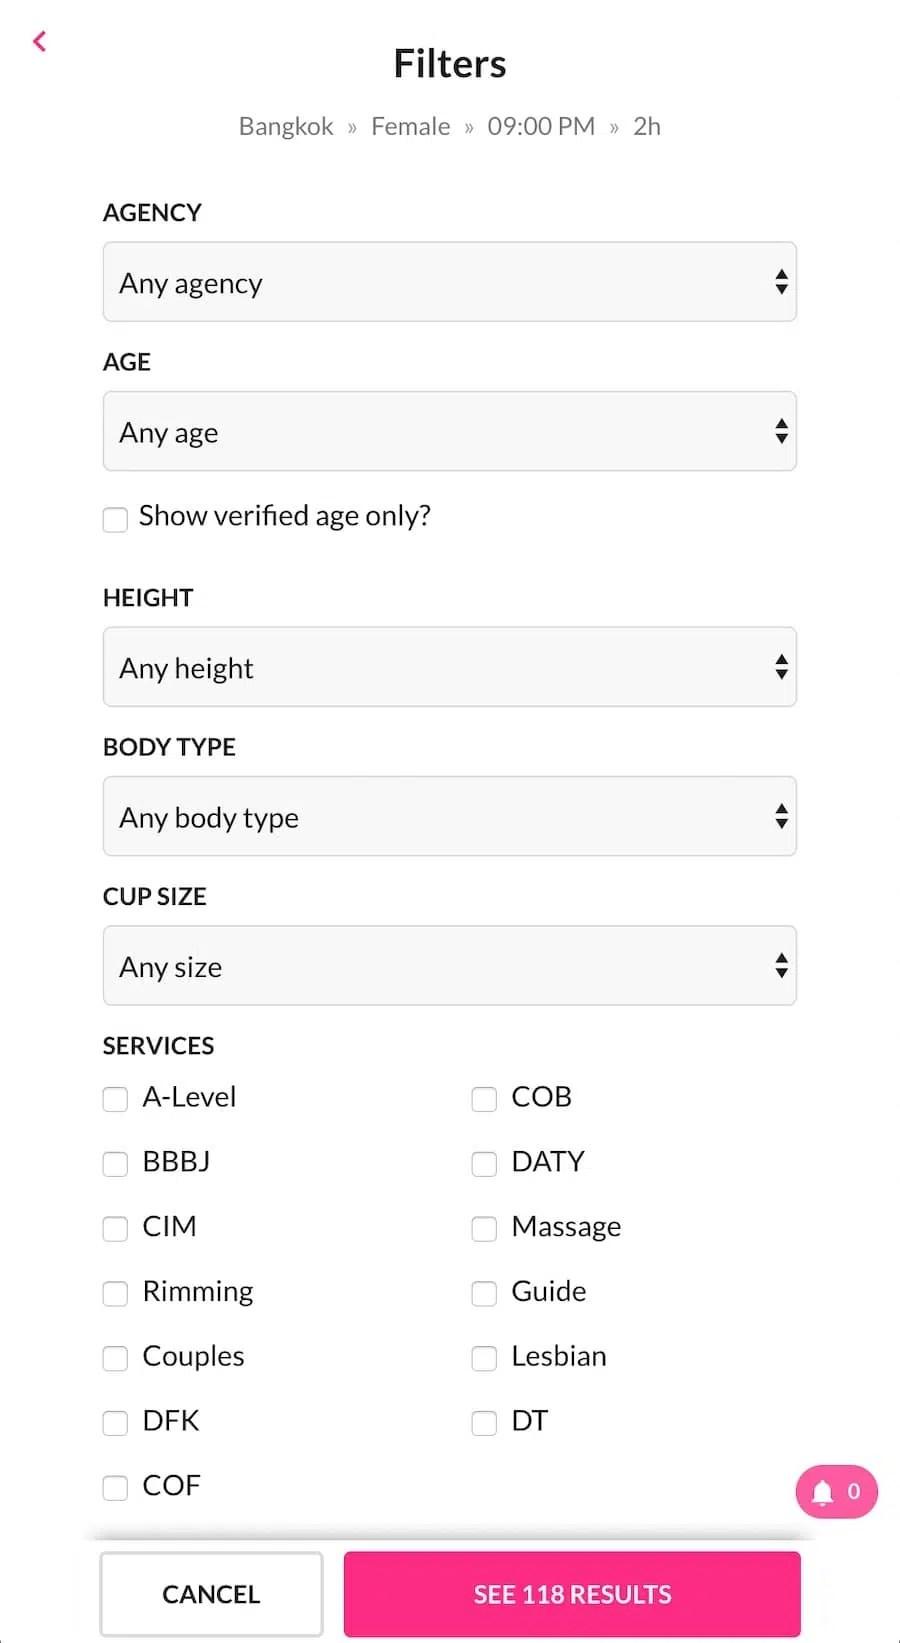 smooci website filters